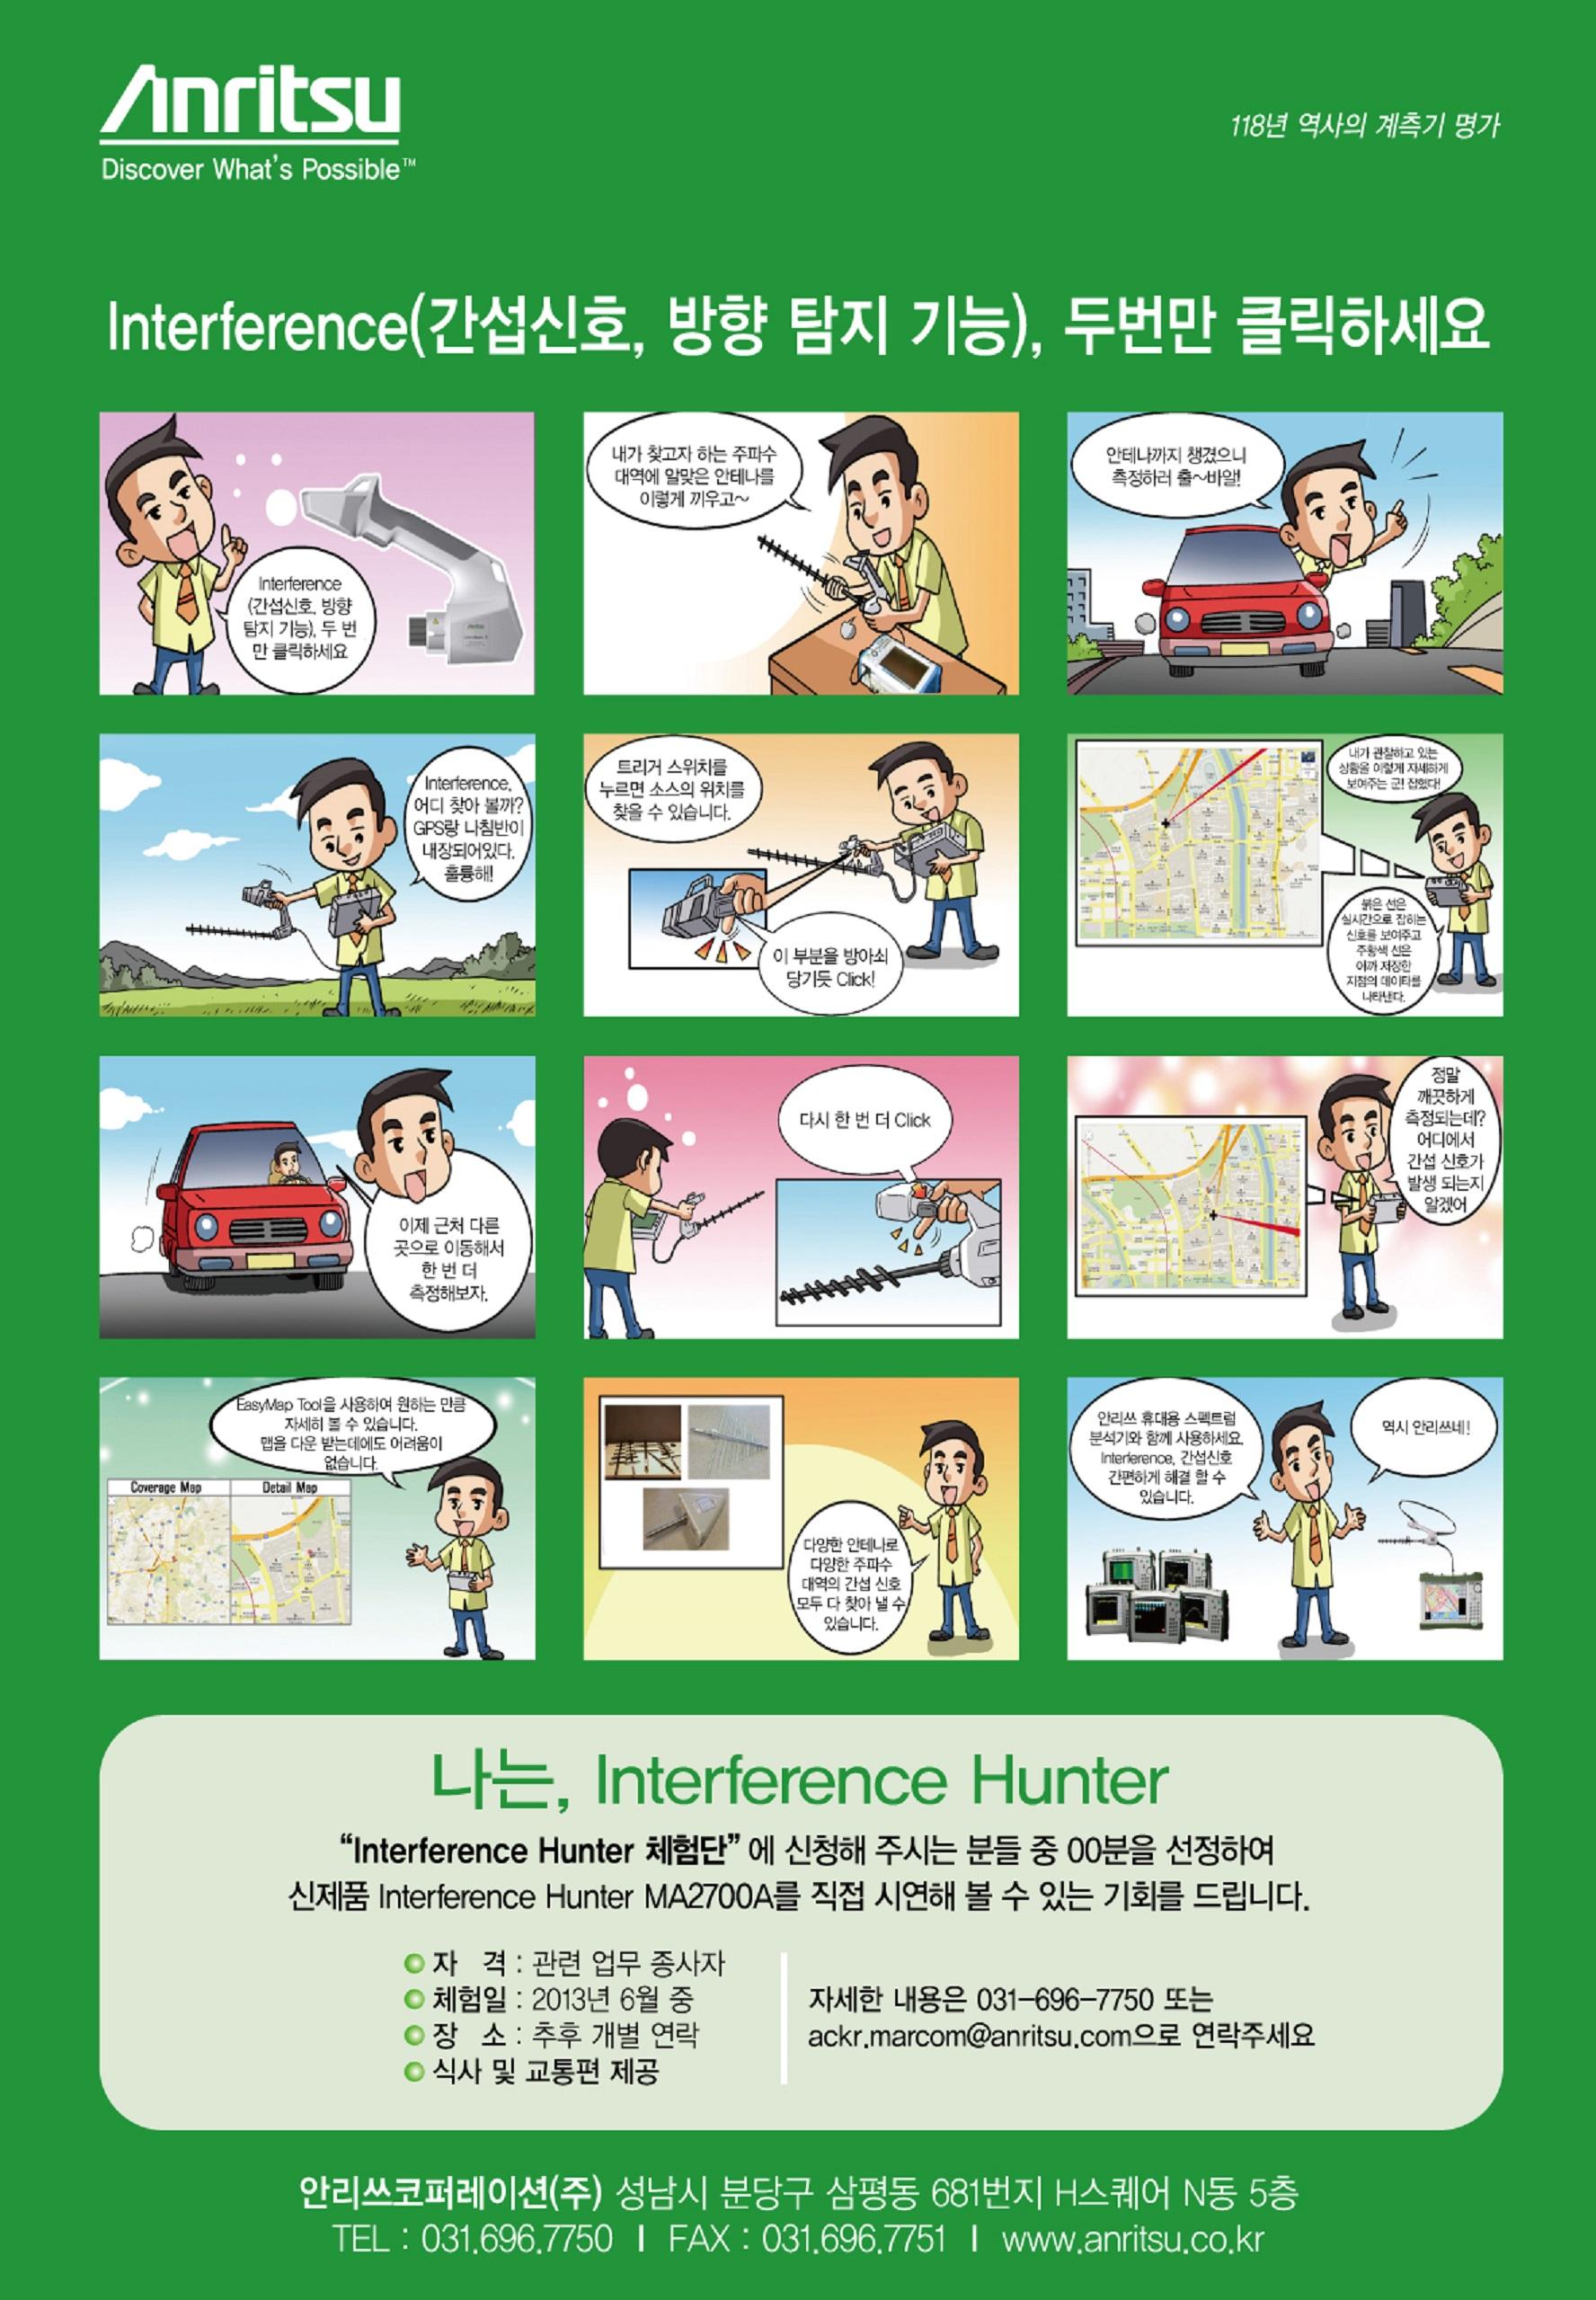 interference hunter 모집